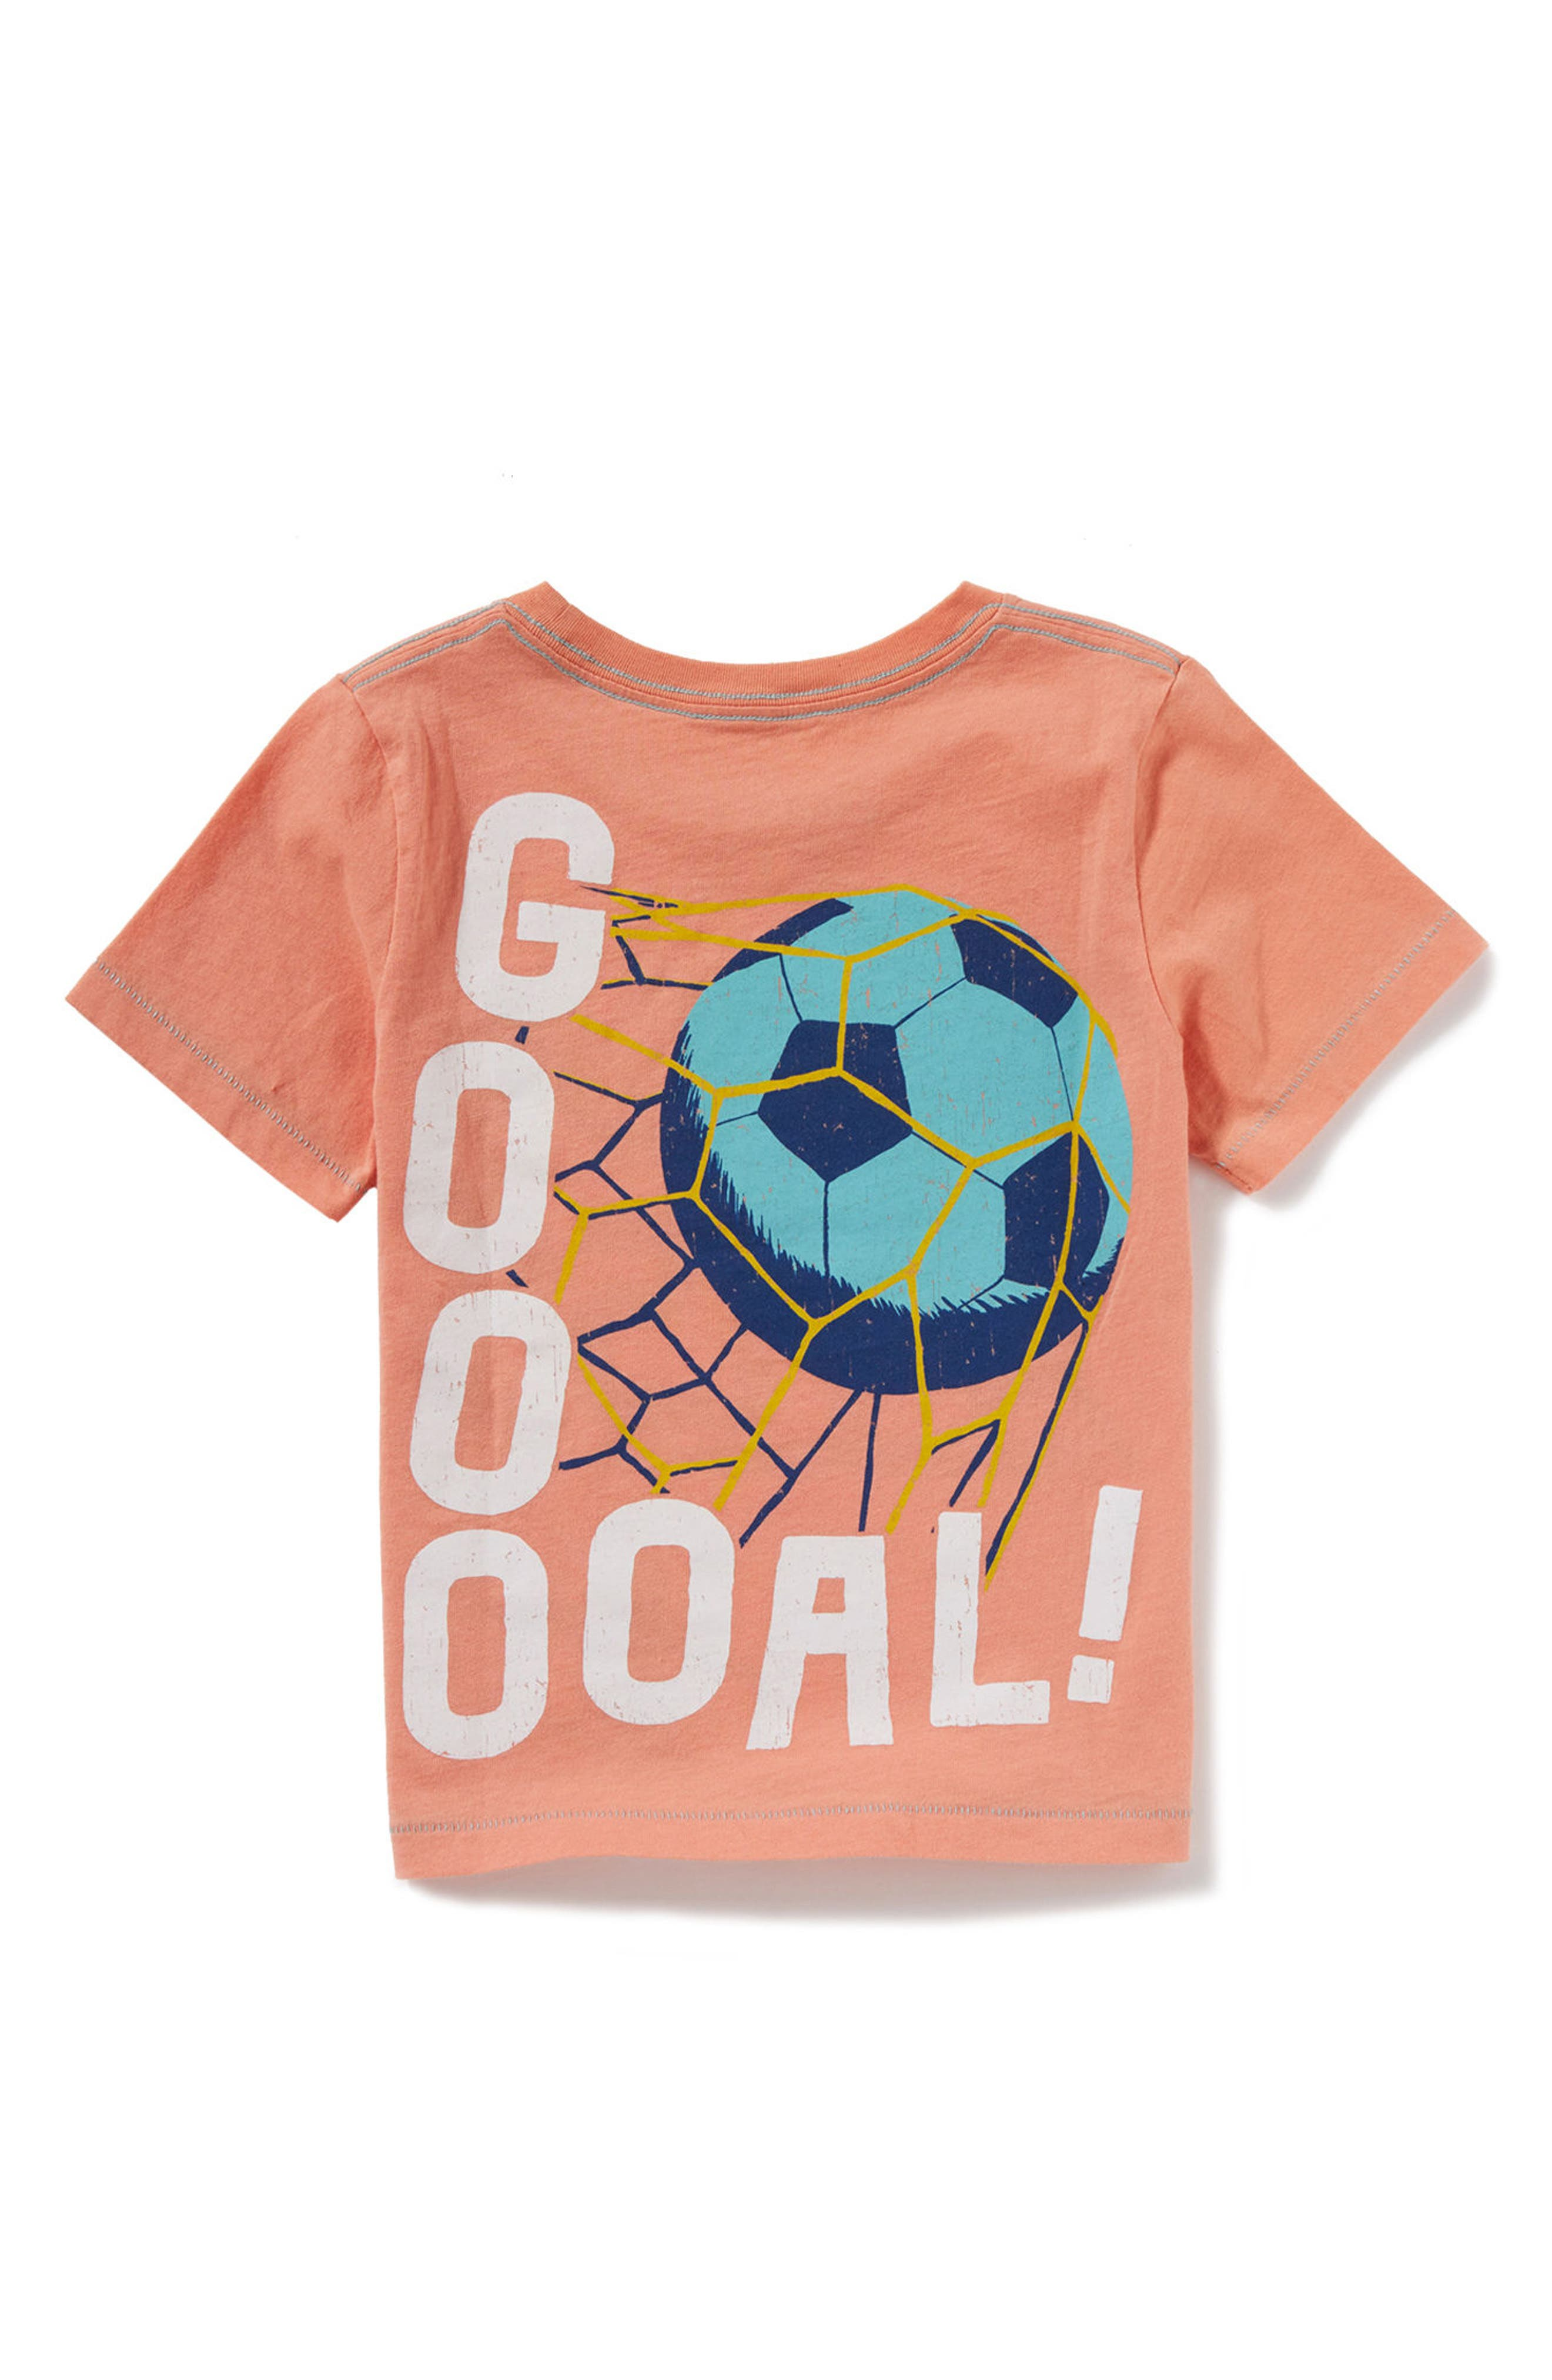 Run Pass Shoot Graphic T-Shirt,                             Alternate thumbnail 2, color,                             Peach